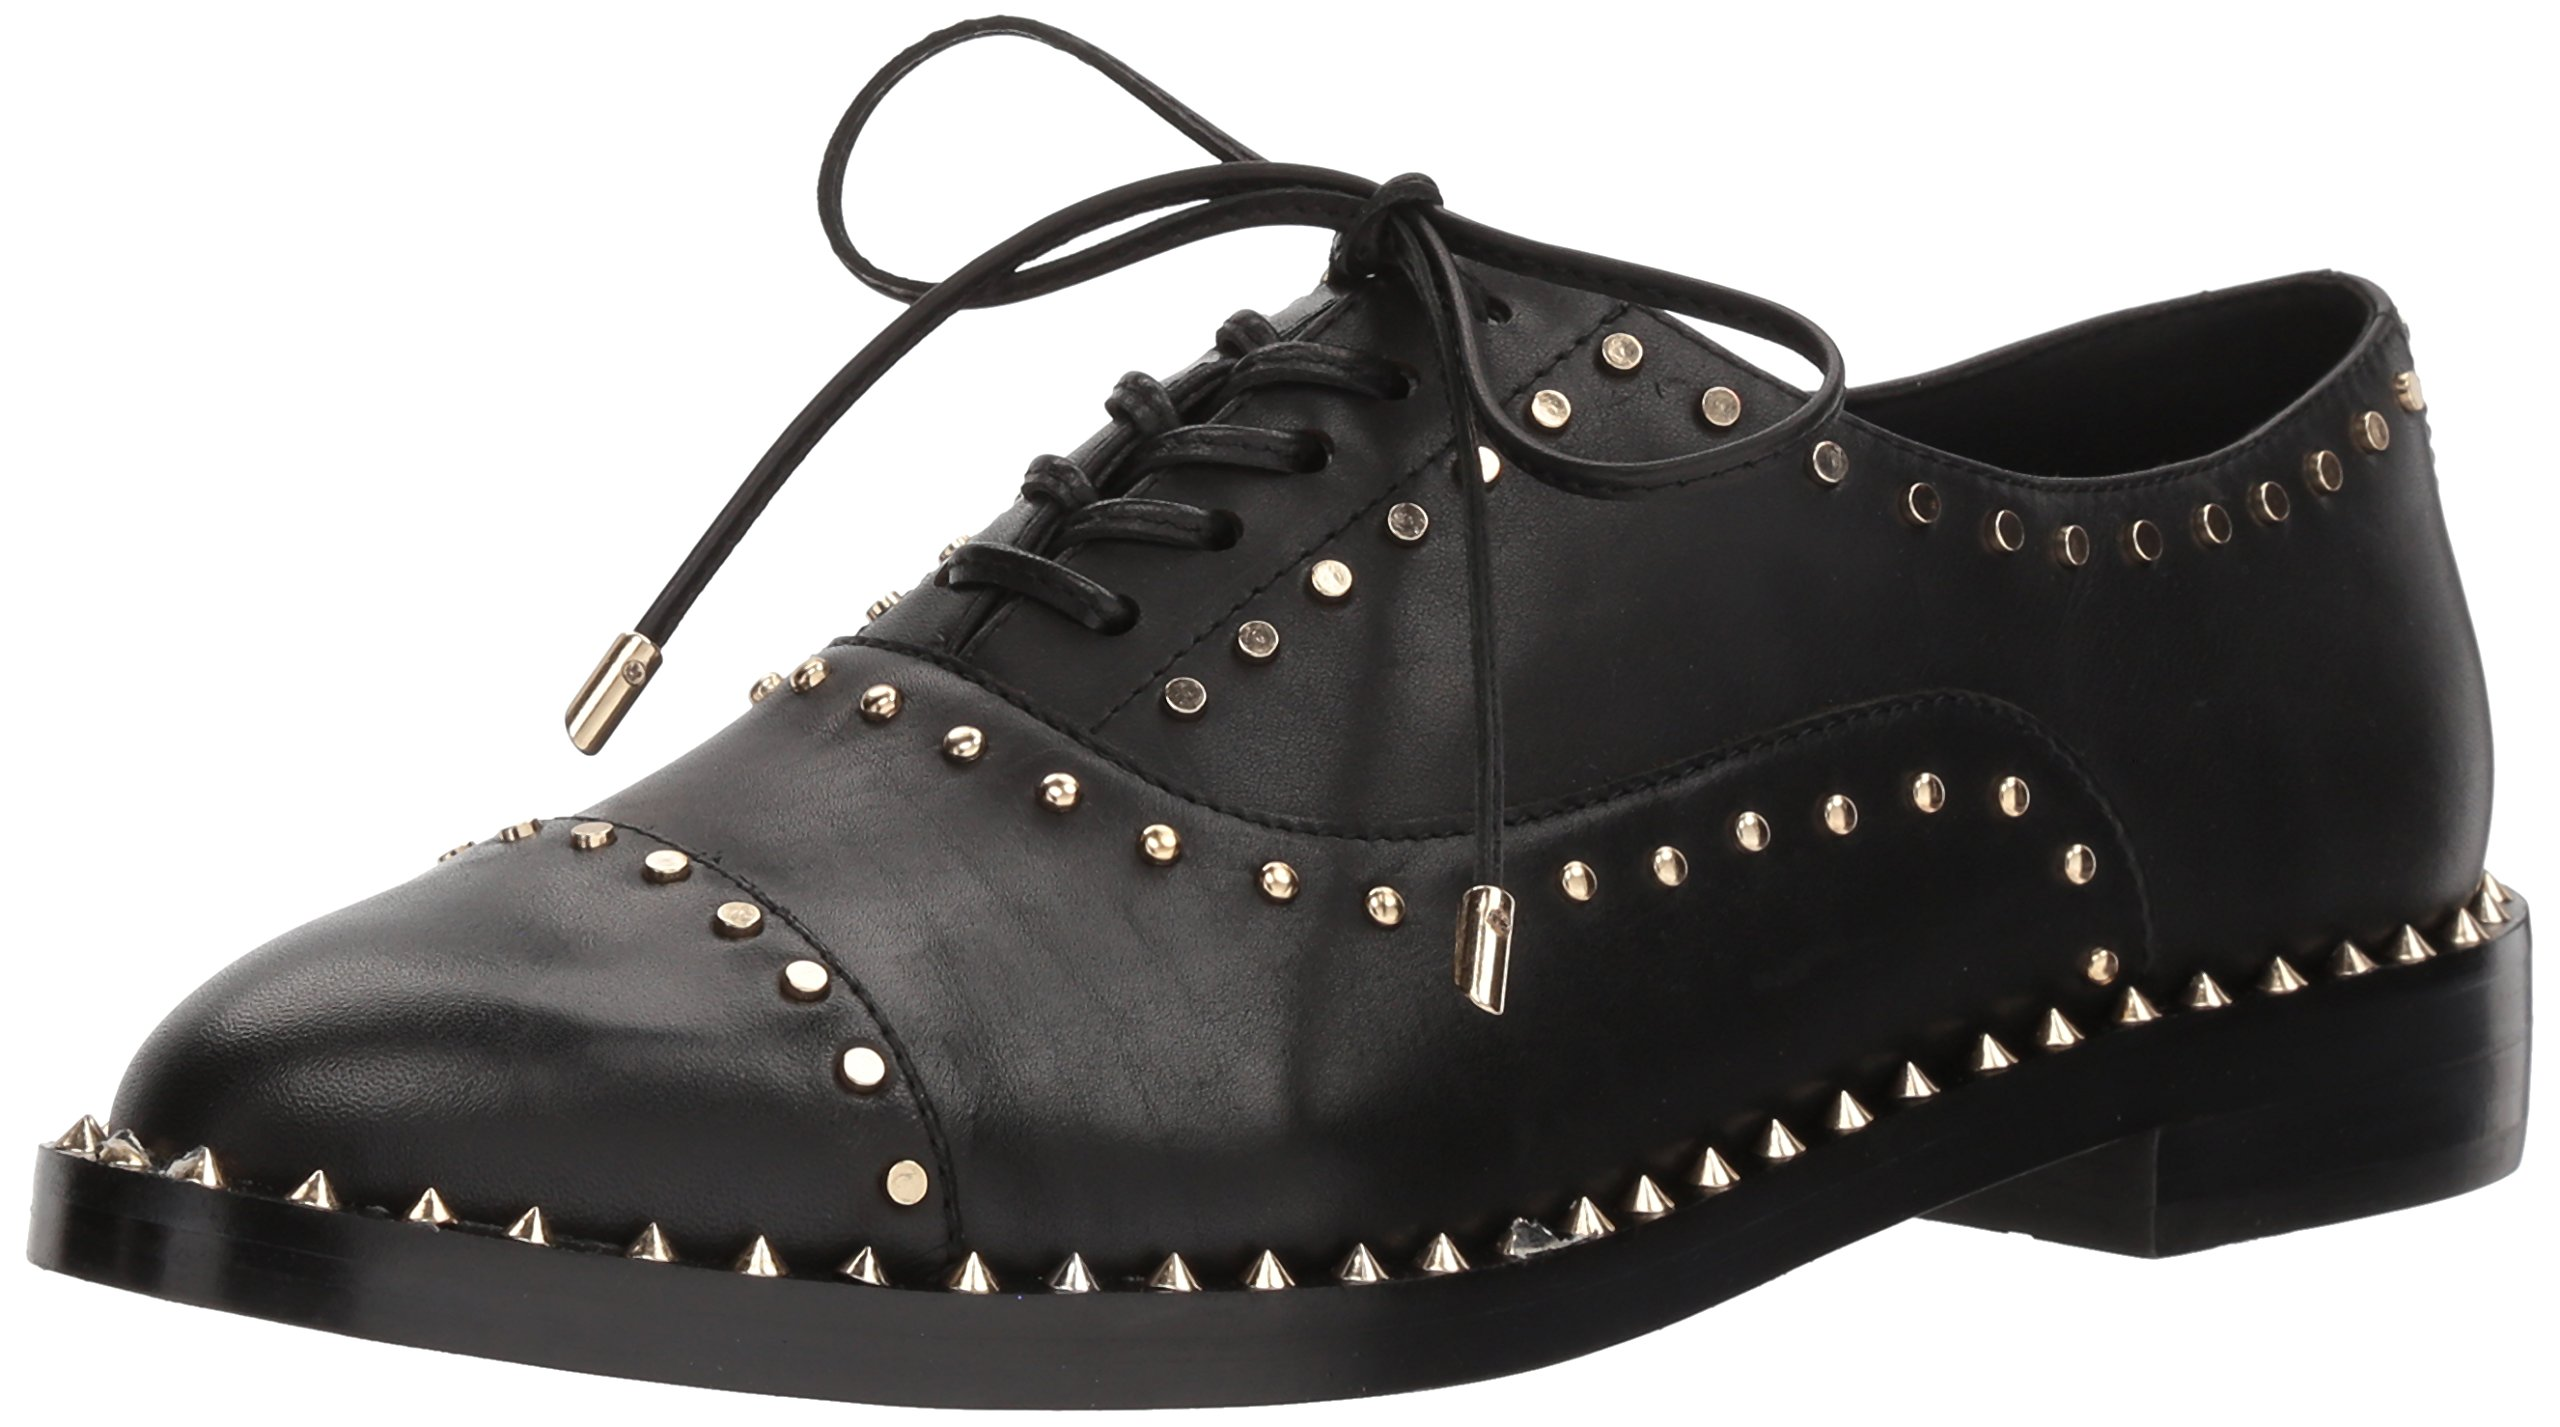 Nine West Women's Garroy Leather Oxford Flat, Black Leather, 6.5 Medium US